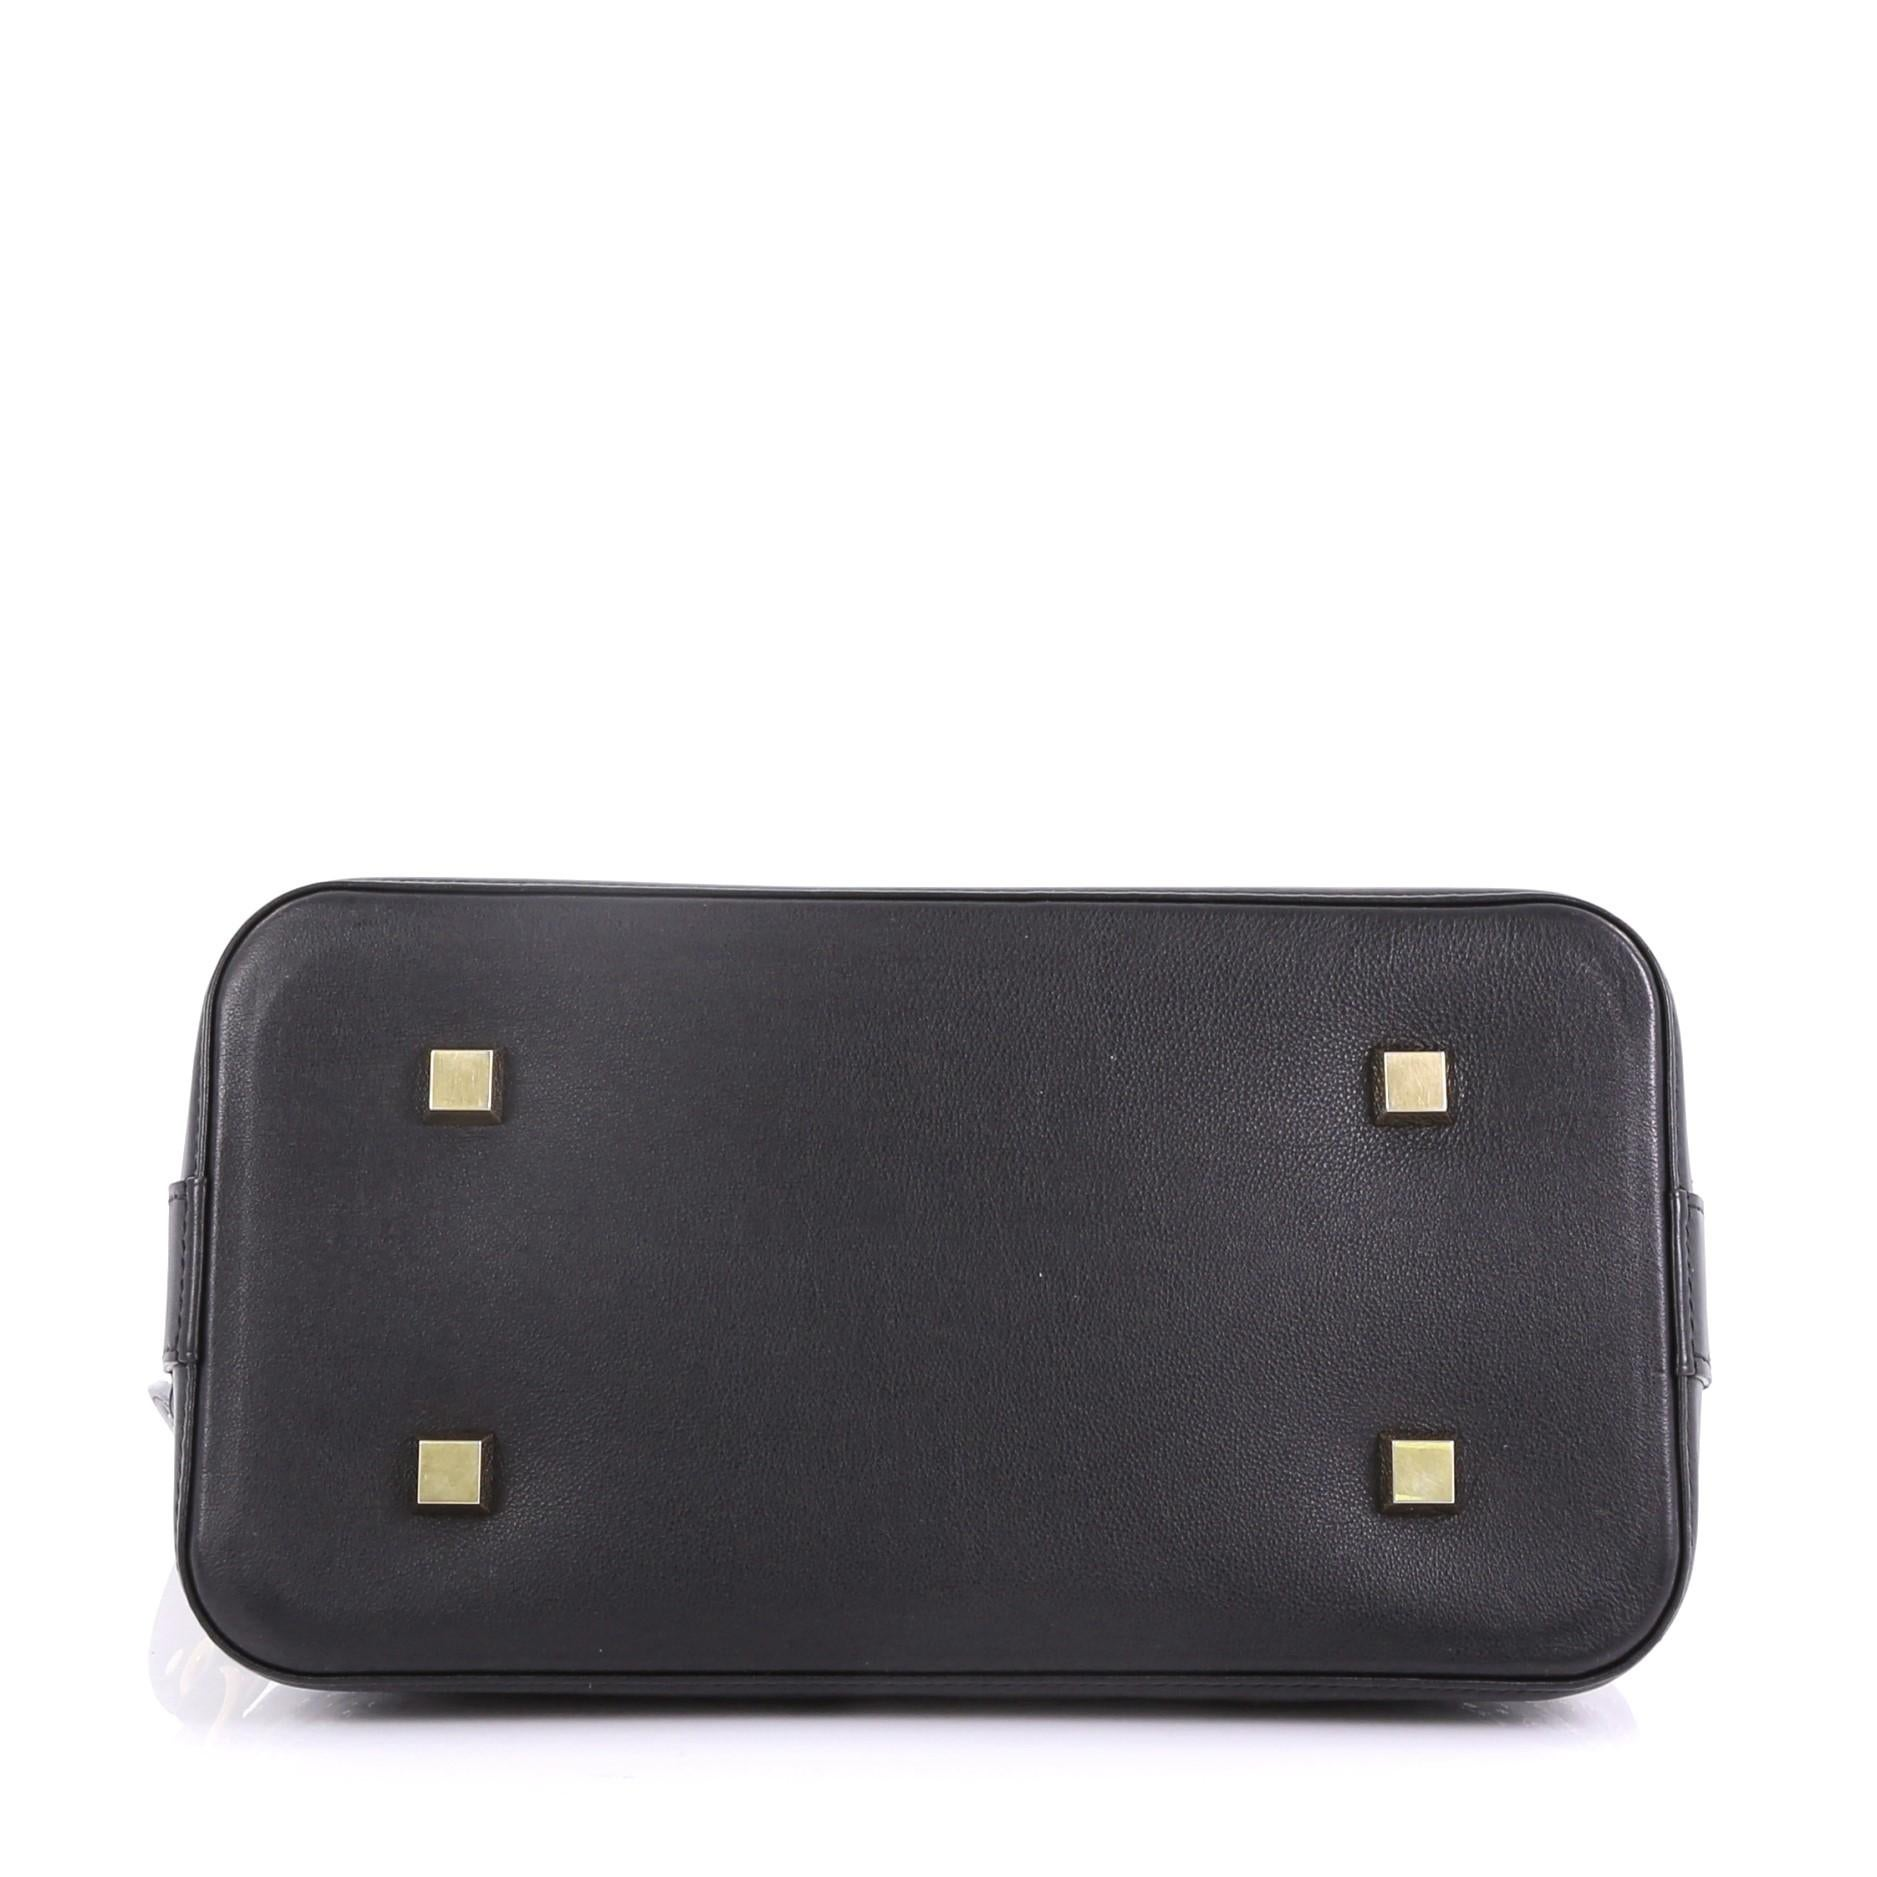 27b39a6f463d Louis Vuitton Alma Handbag Limited Edition Monogram Eclipse Sequins PM at  1stdibs